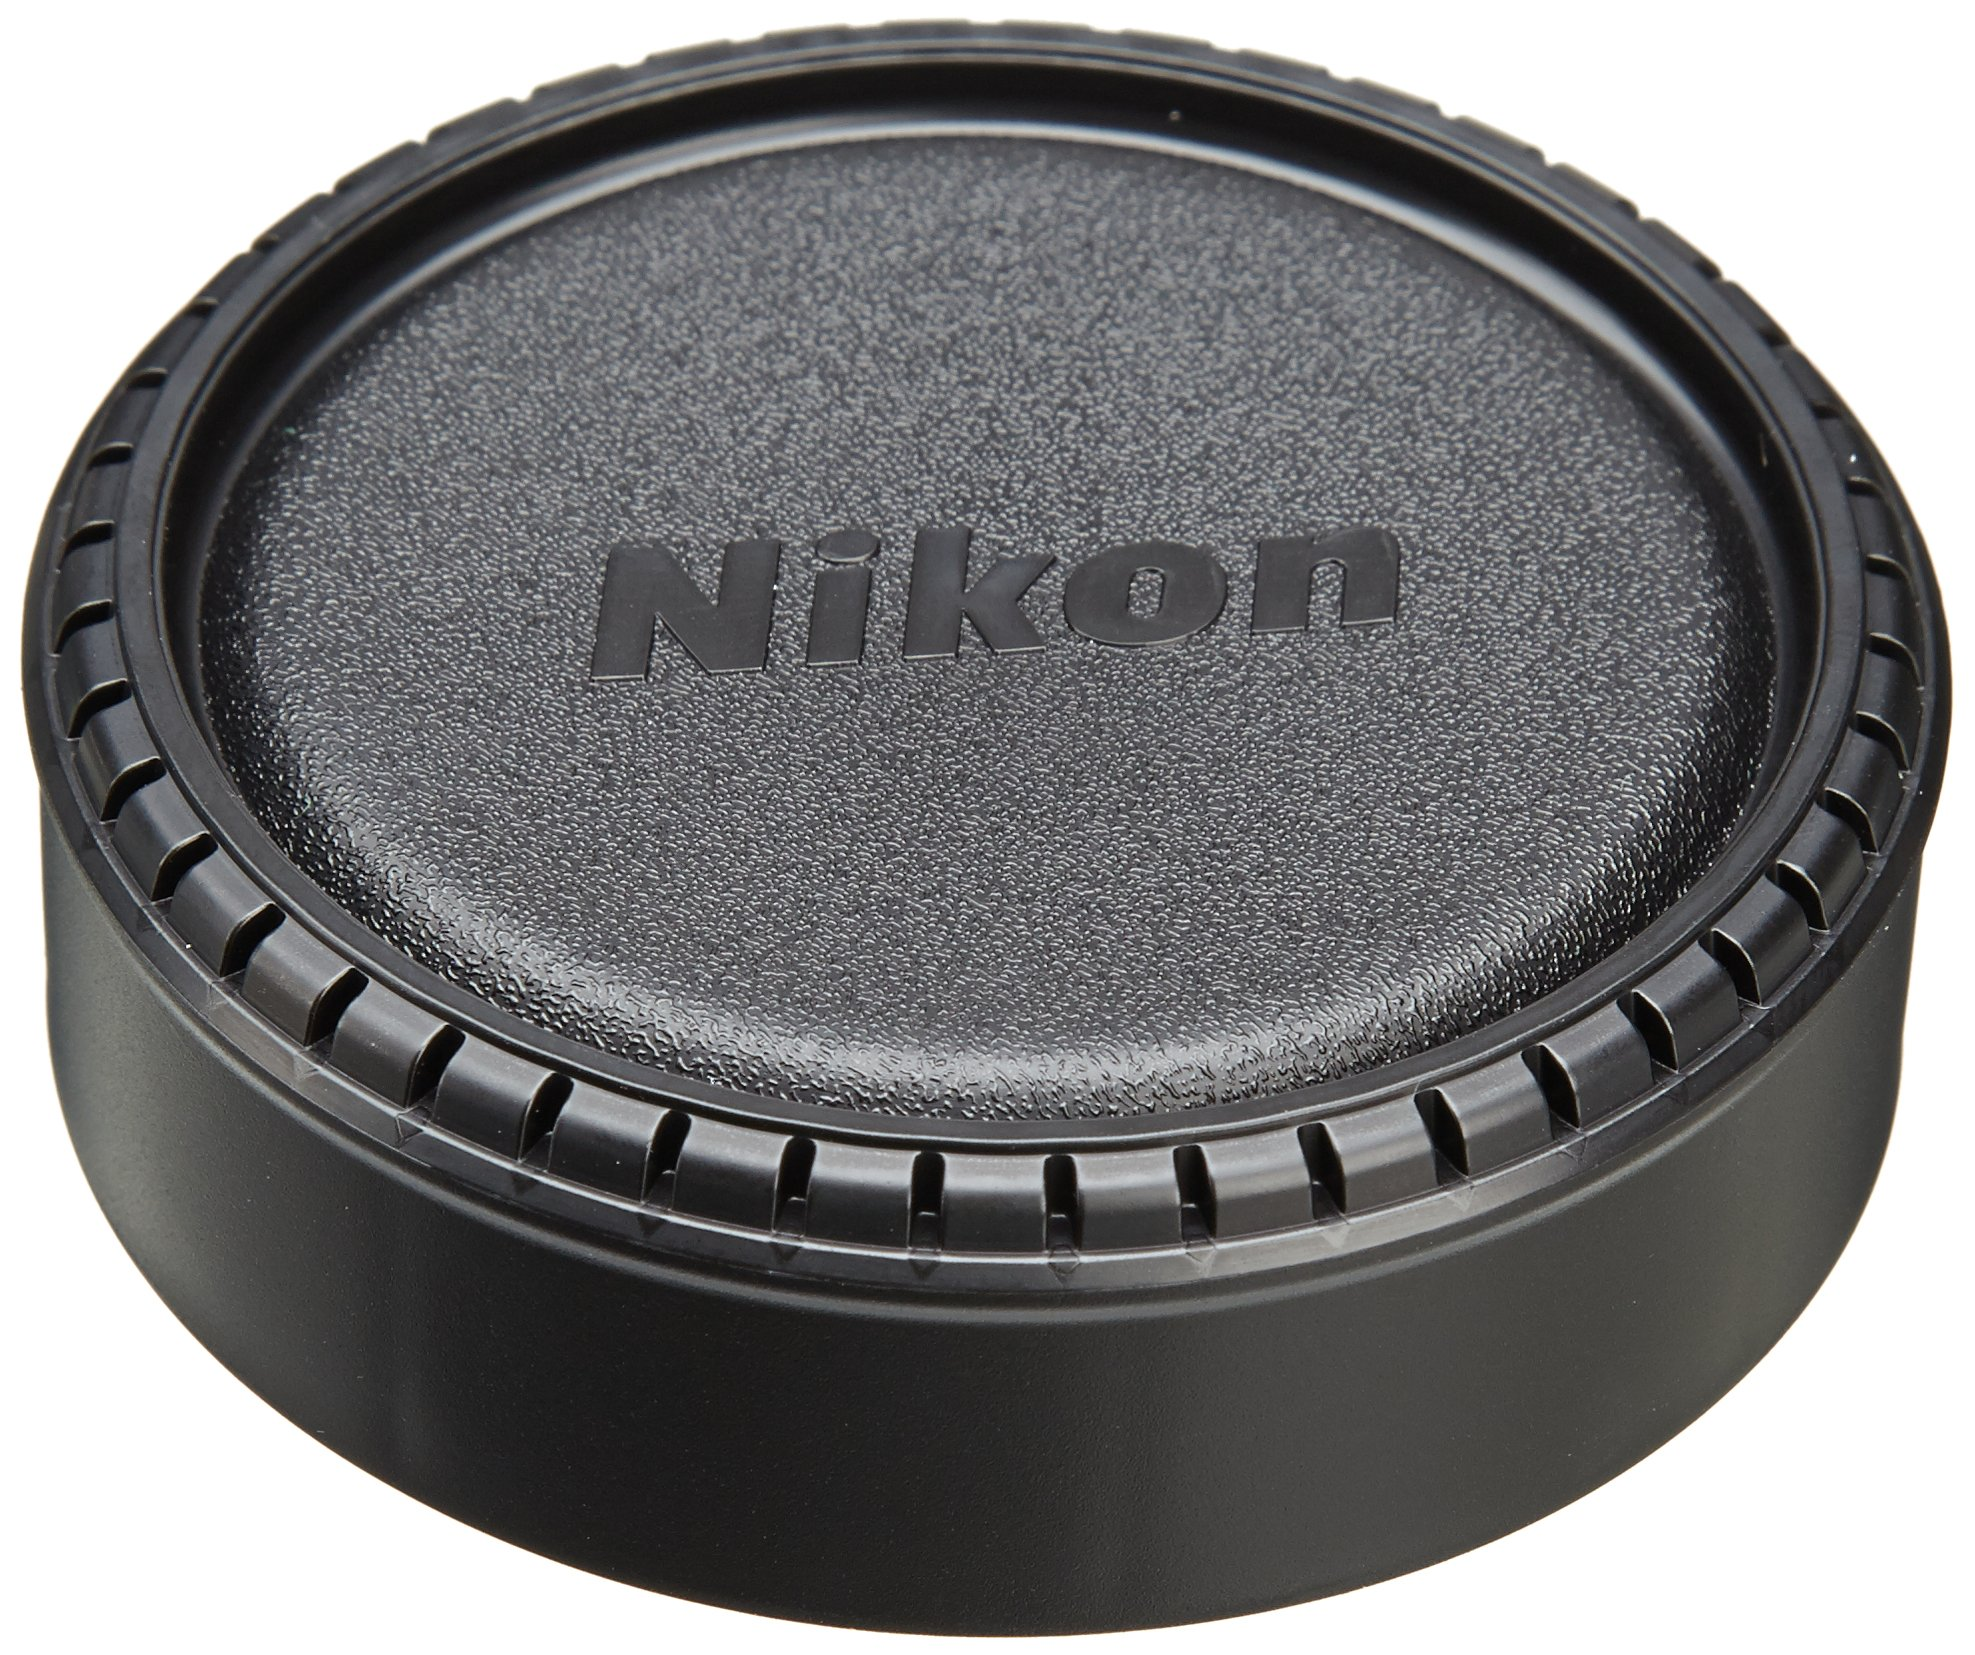 Nikon Slip-ON Front Lens Cap F/ 16/2.8, 10.5DX